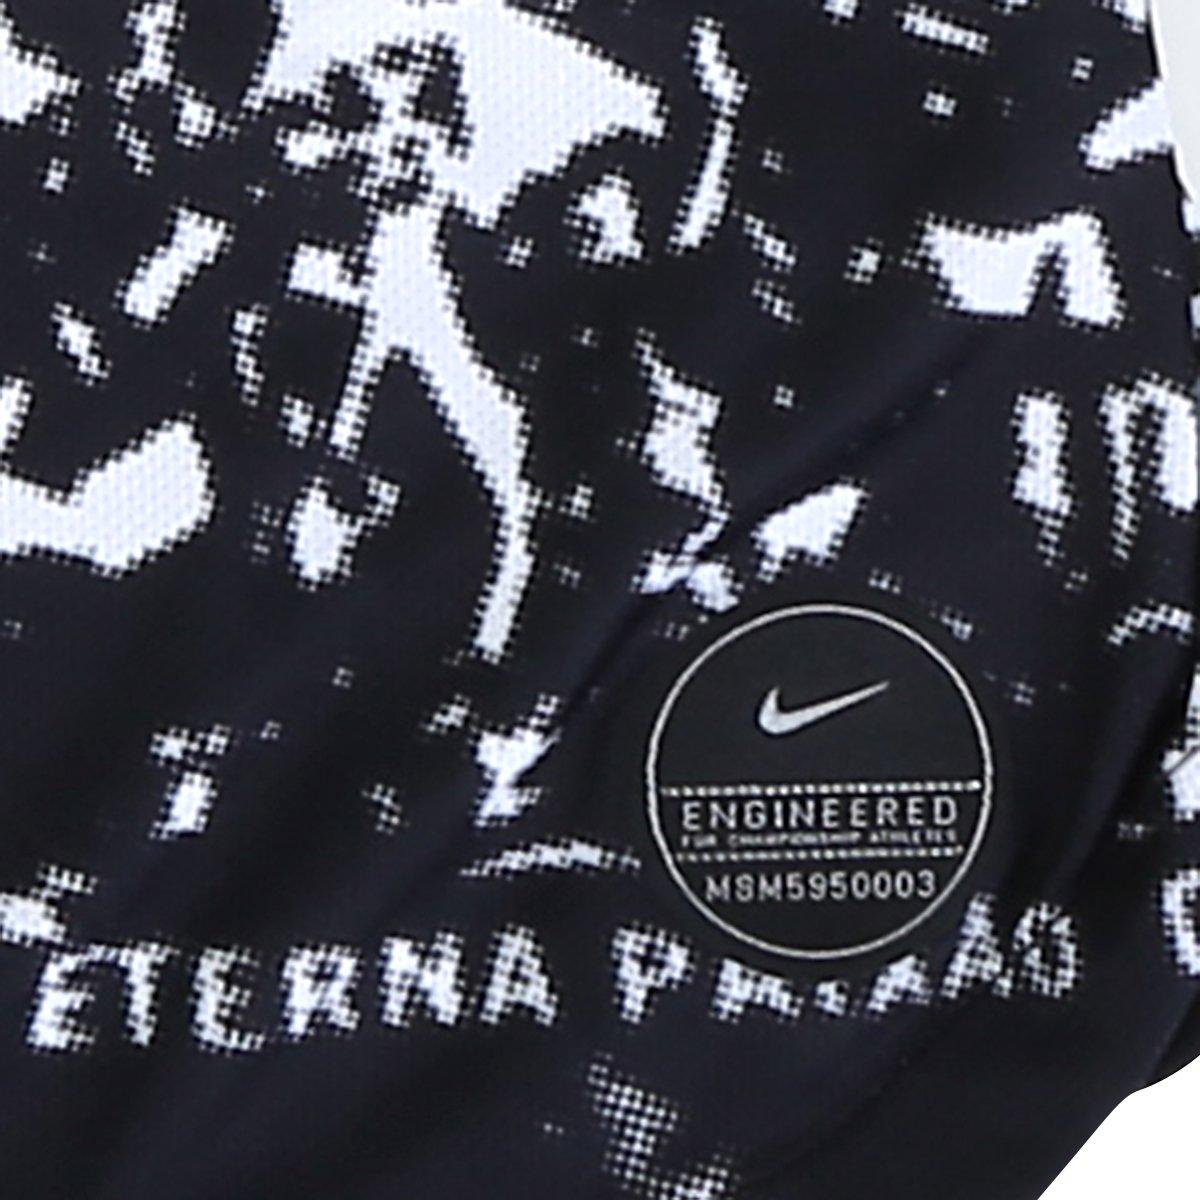 Camisa Corinthians III Invasões 19/20 Torcedor s/nº Nike Feminina - Tam: G - 3